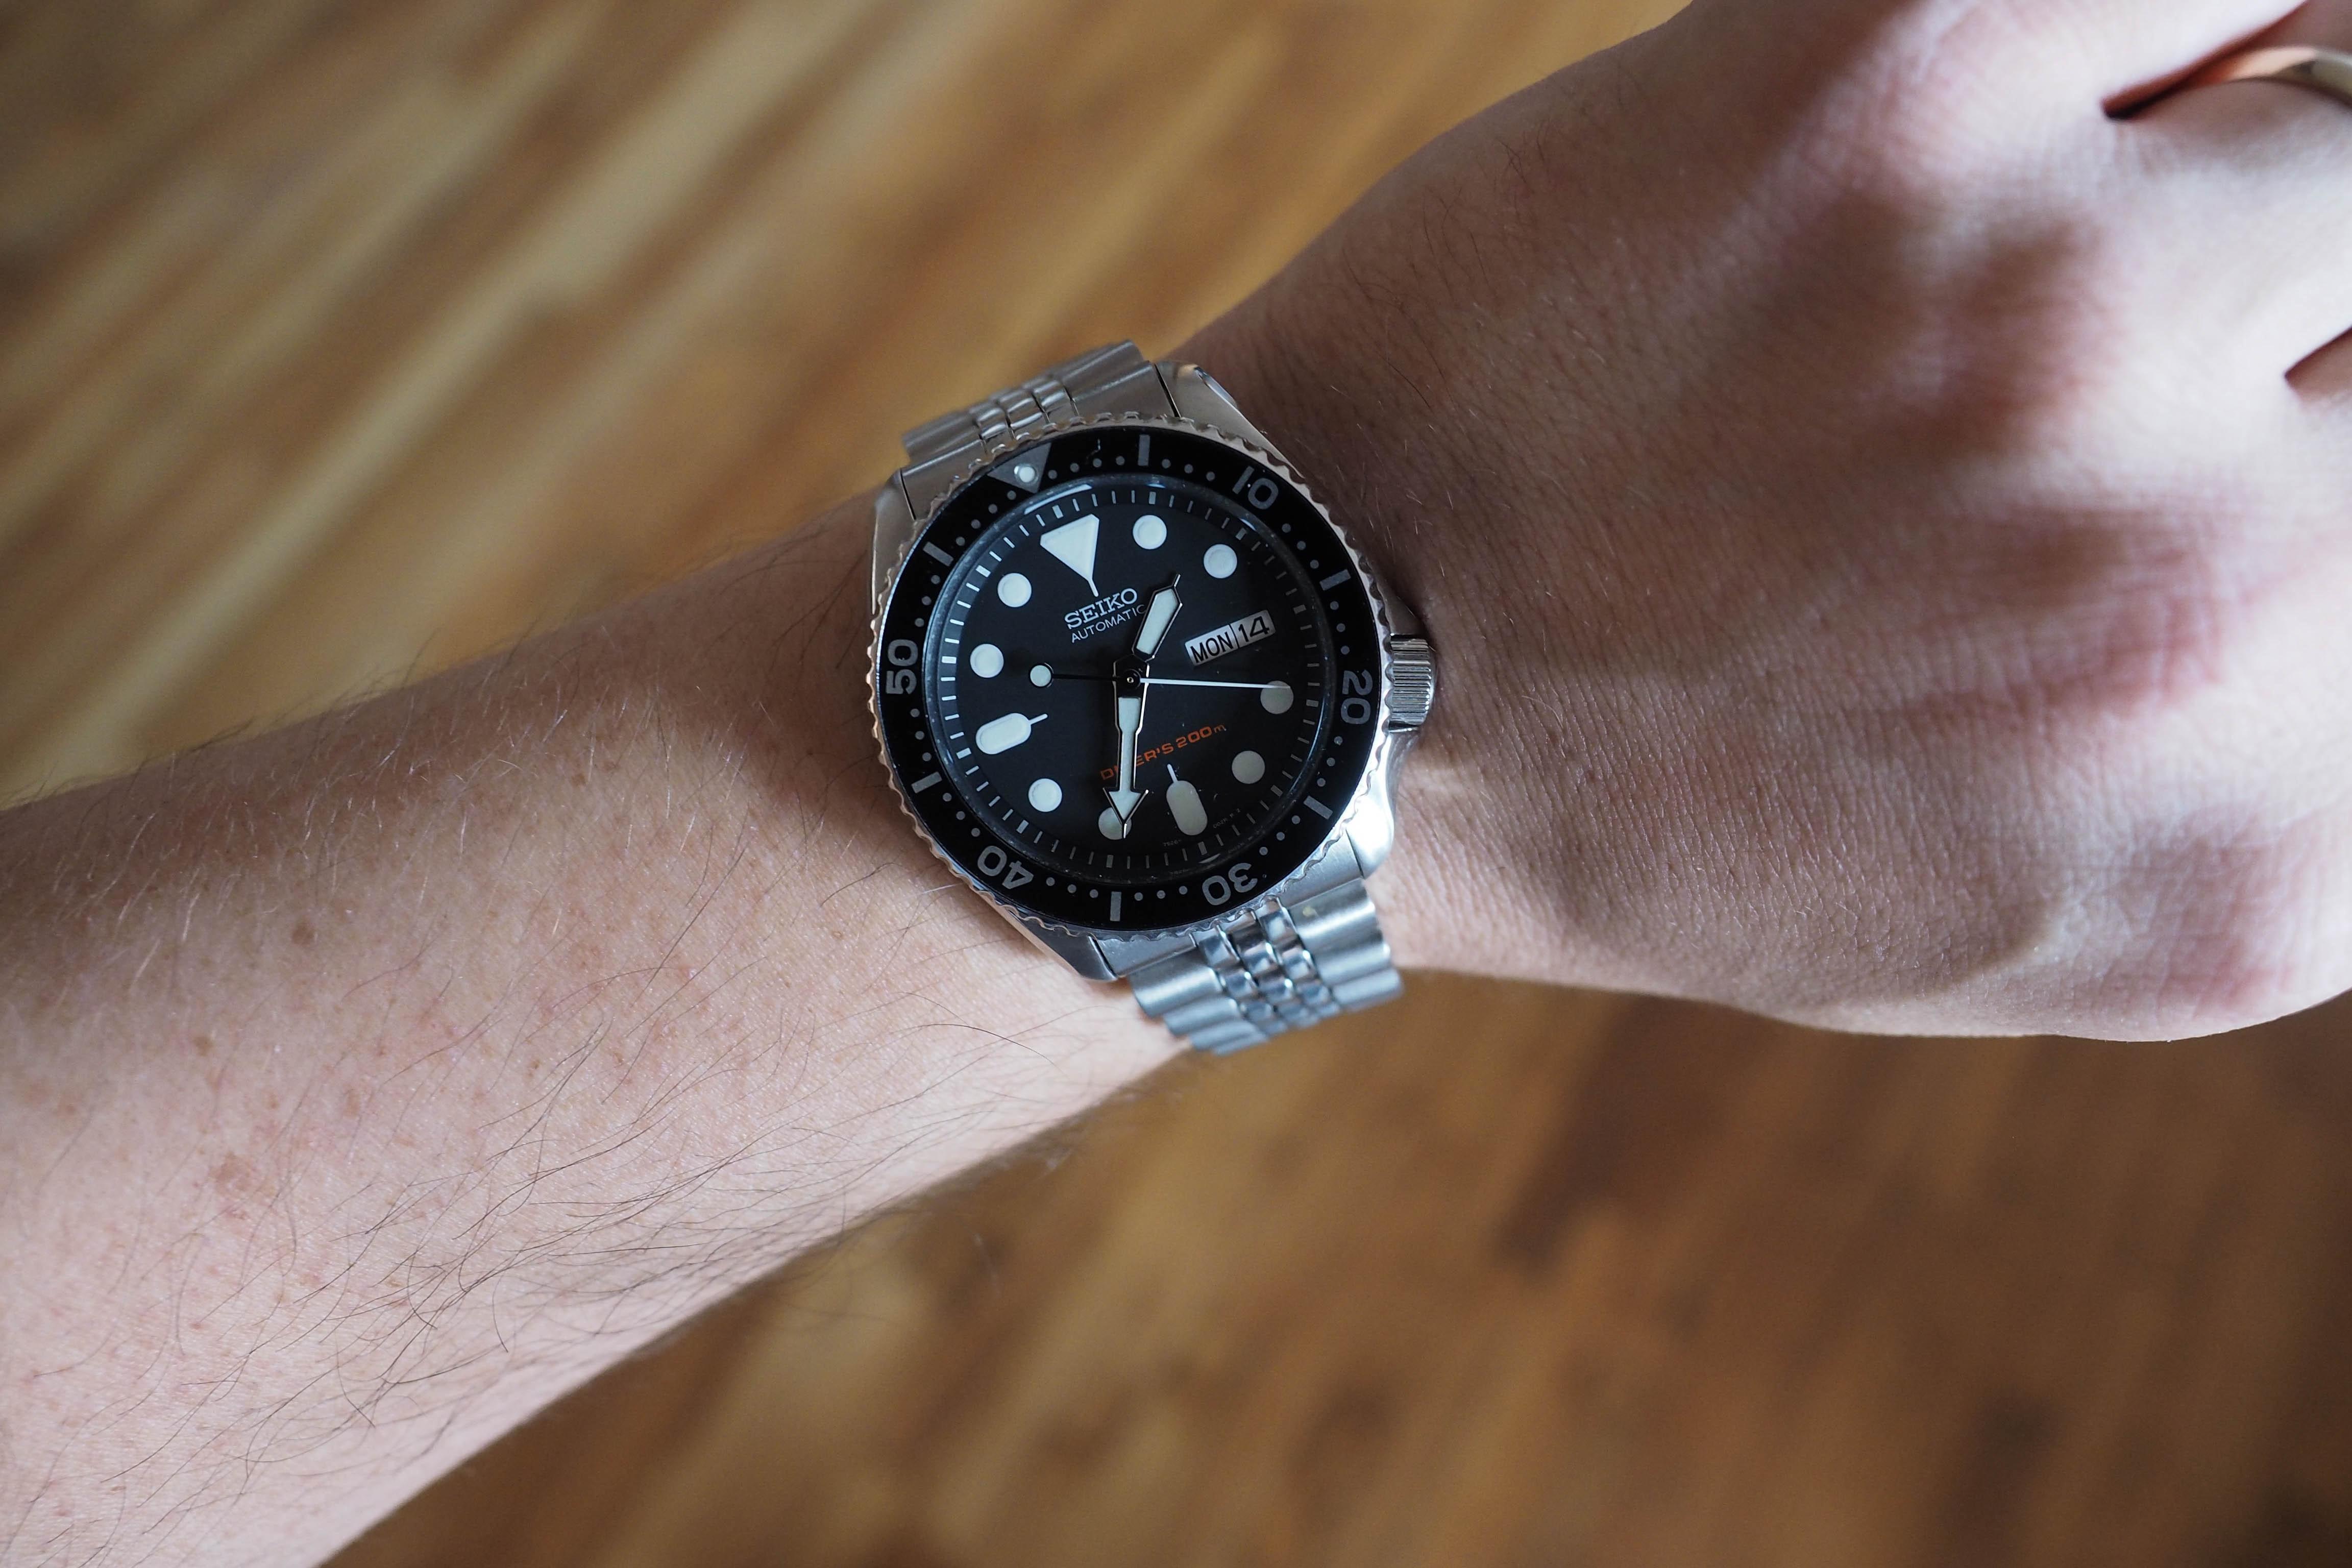 Seiko SKX007 Wrist shot